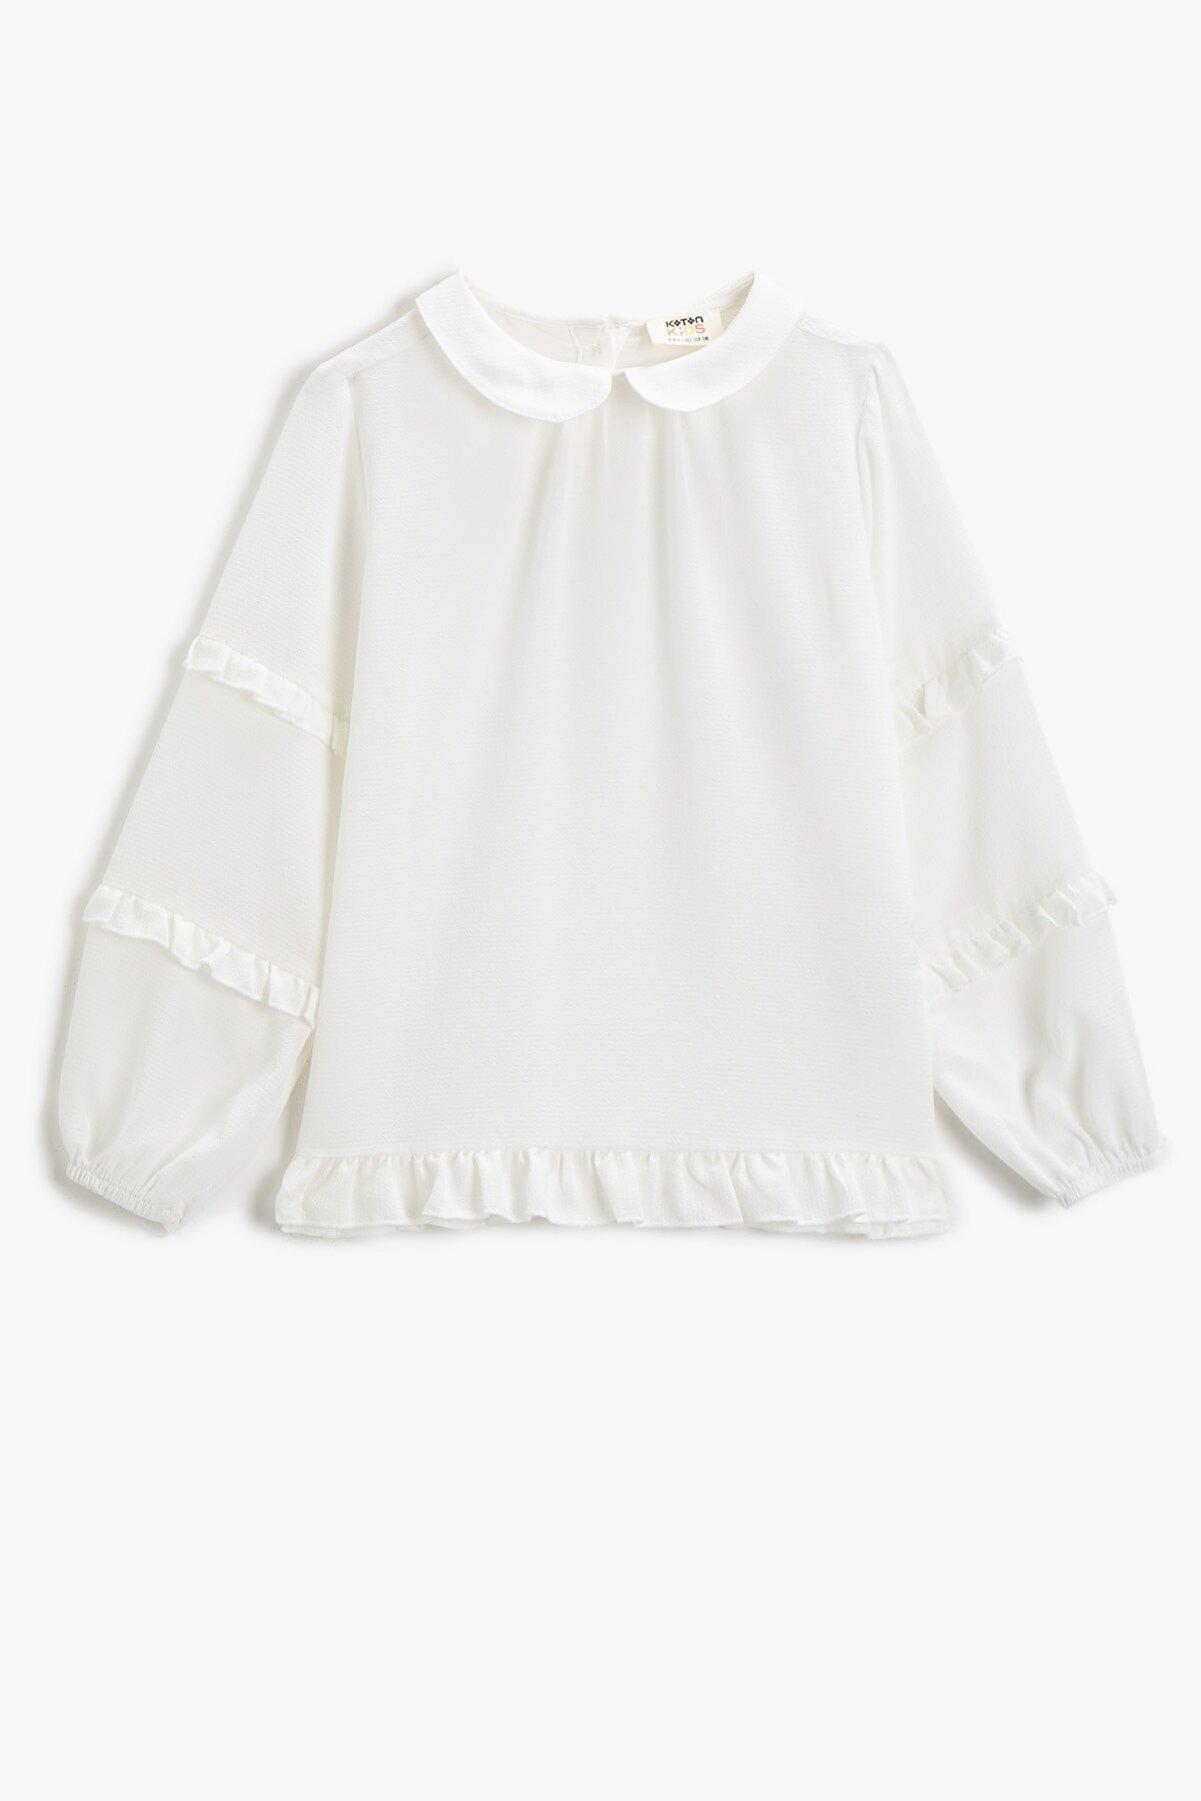 Koton Kız Çocuk Ekru Bluz 2KKG67841AW